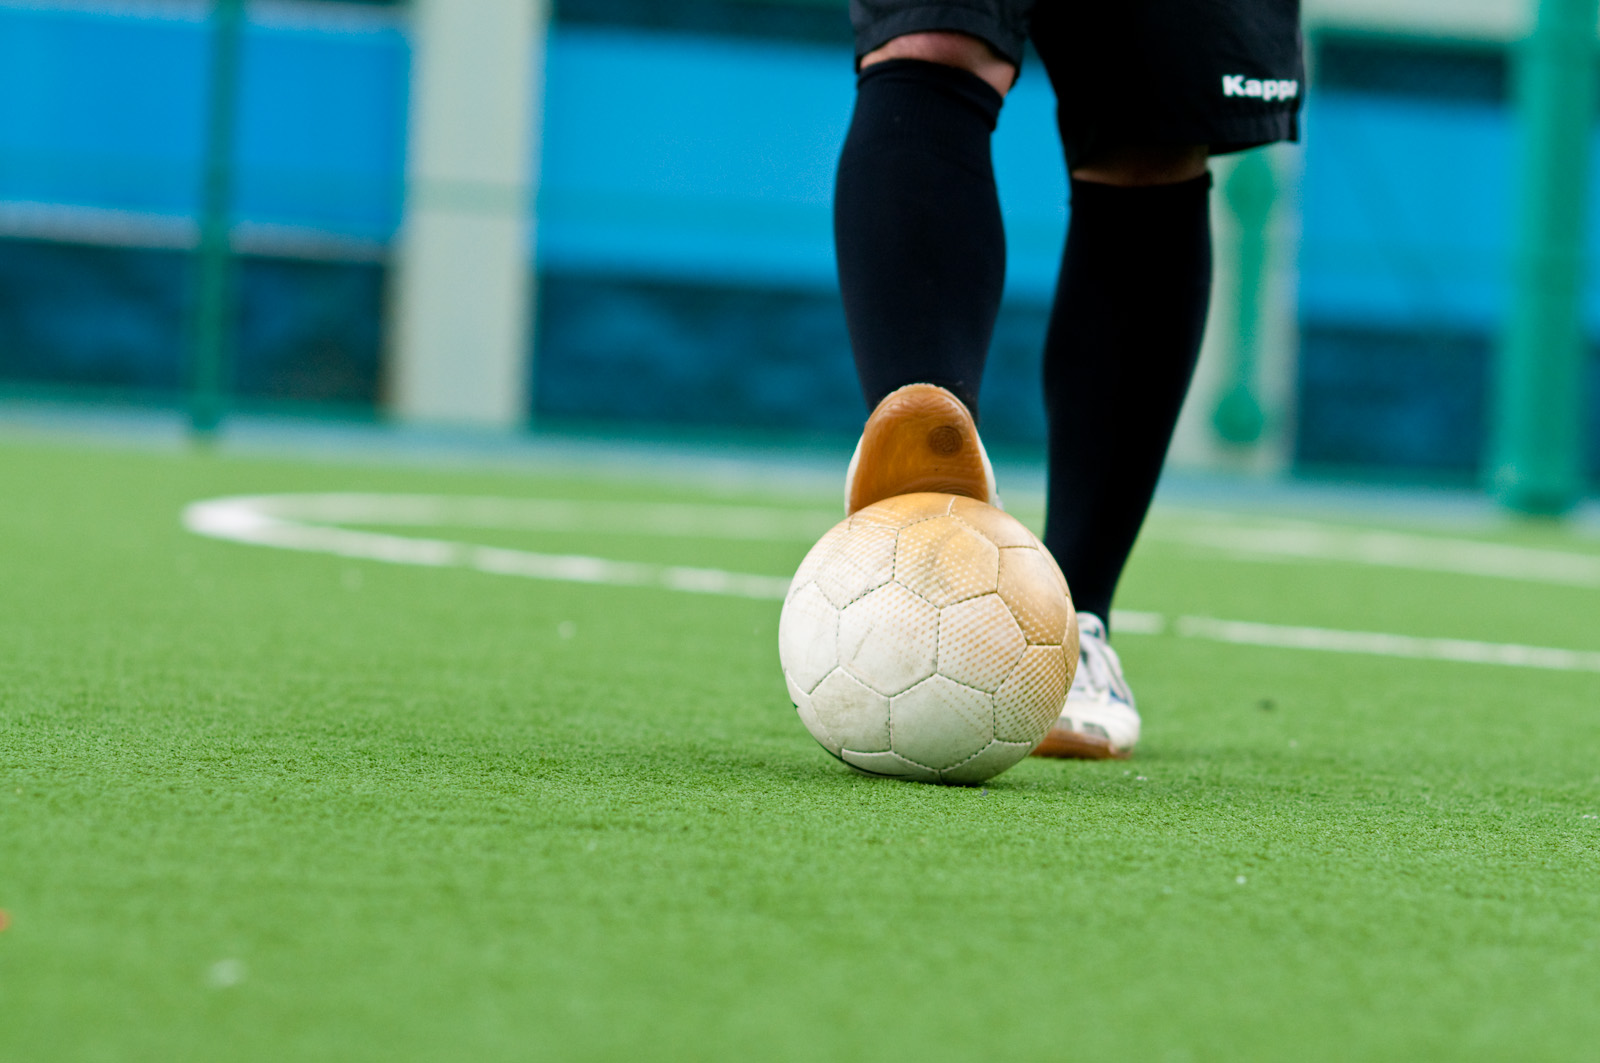 AFCフットサル選手権2016 放送スケジュール 【頑張れ!フットサル日本代表】